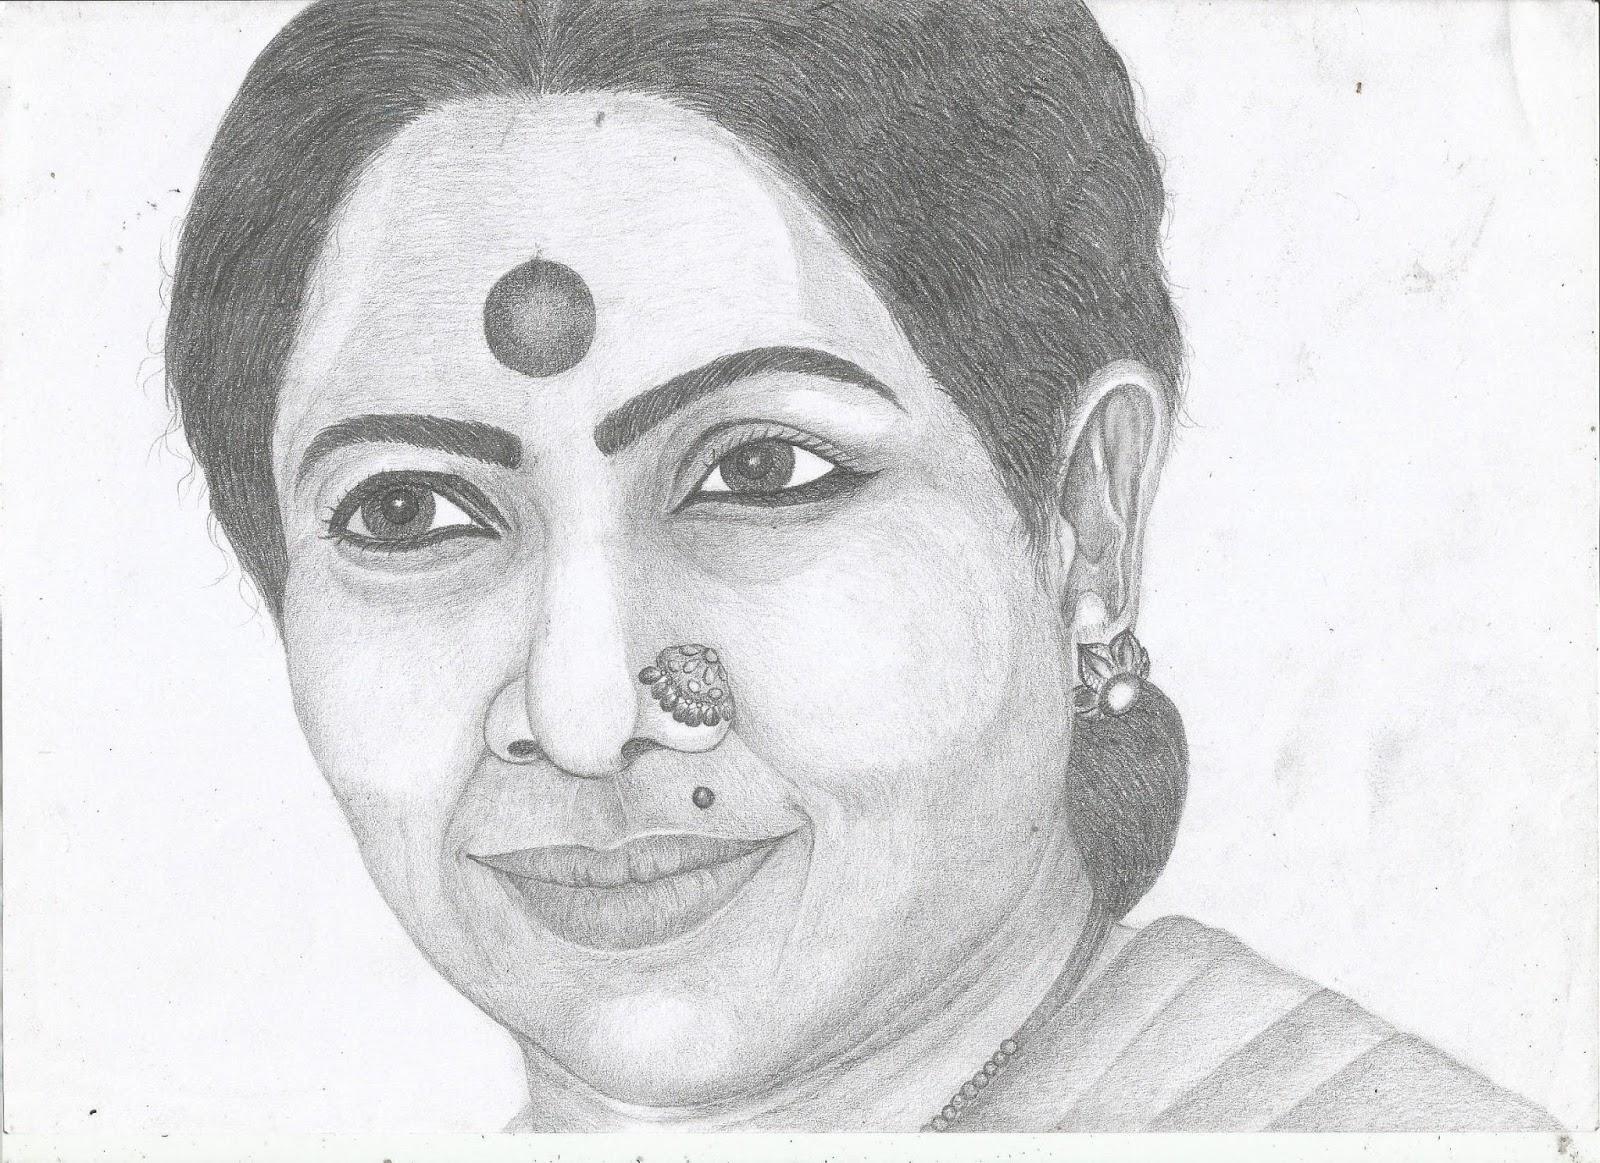 Jackhi pencil drawing manorama tamil actress pencil sketch